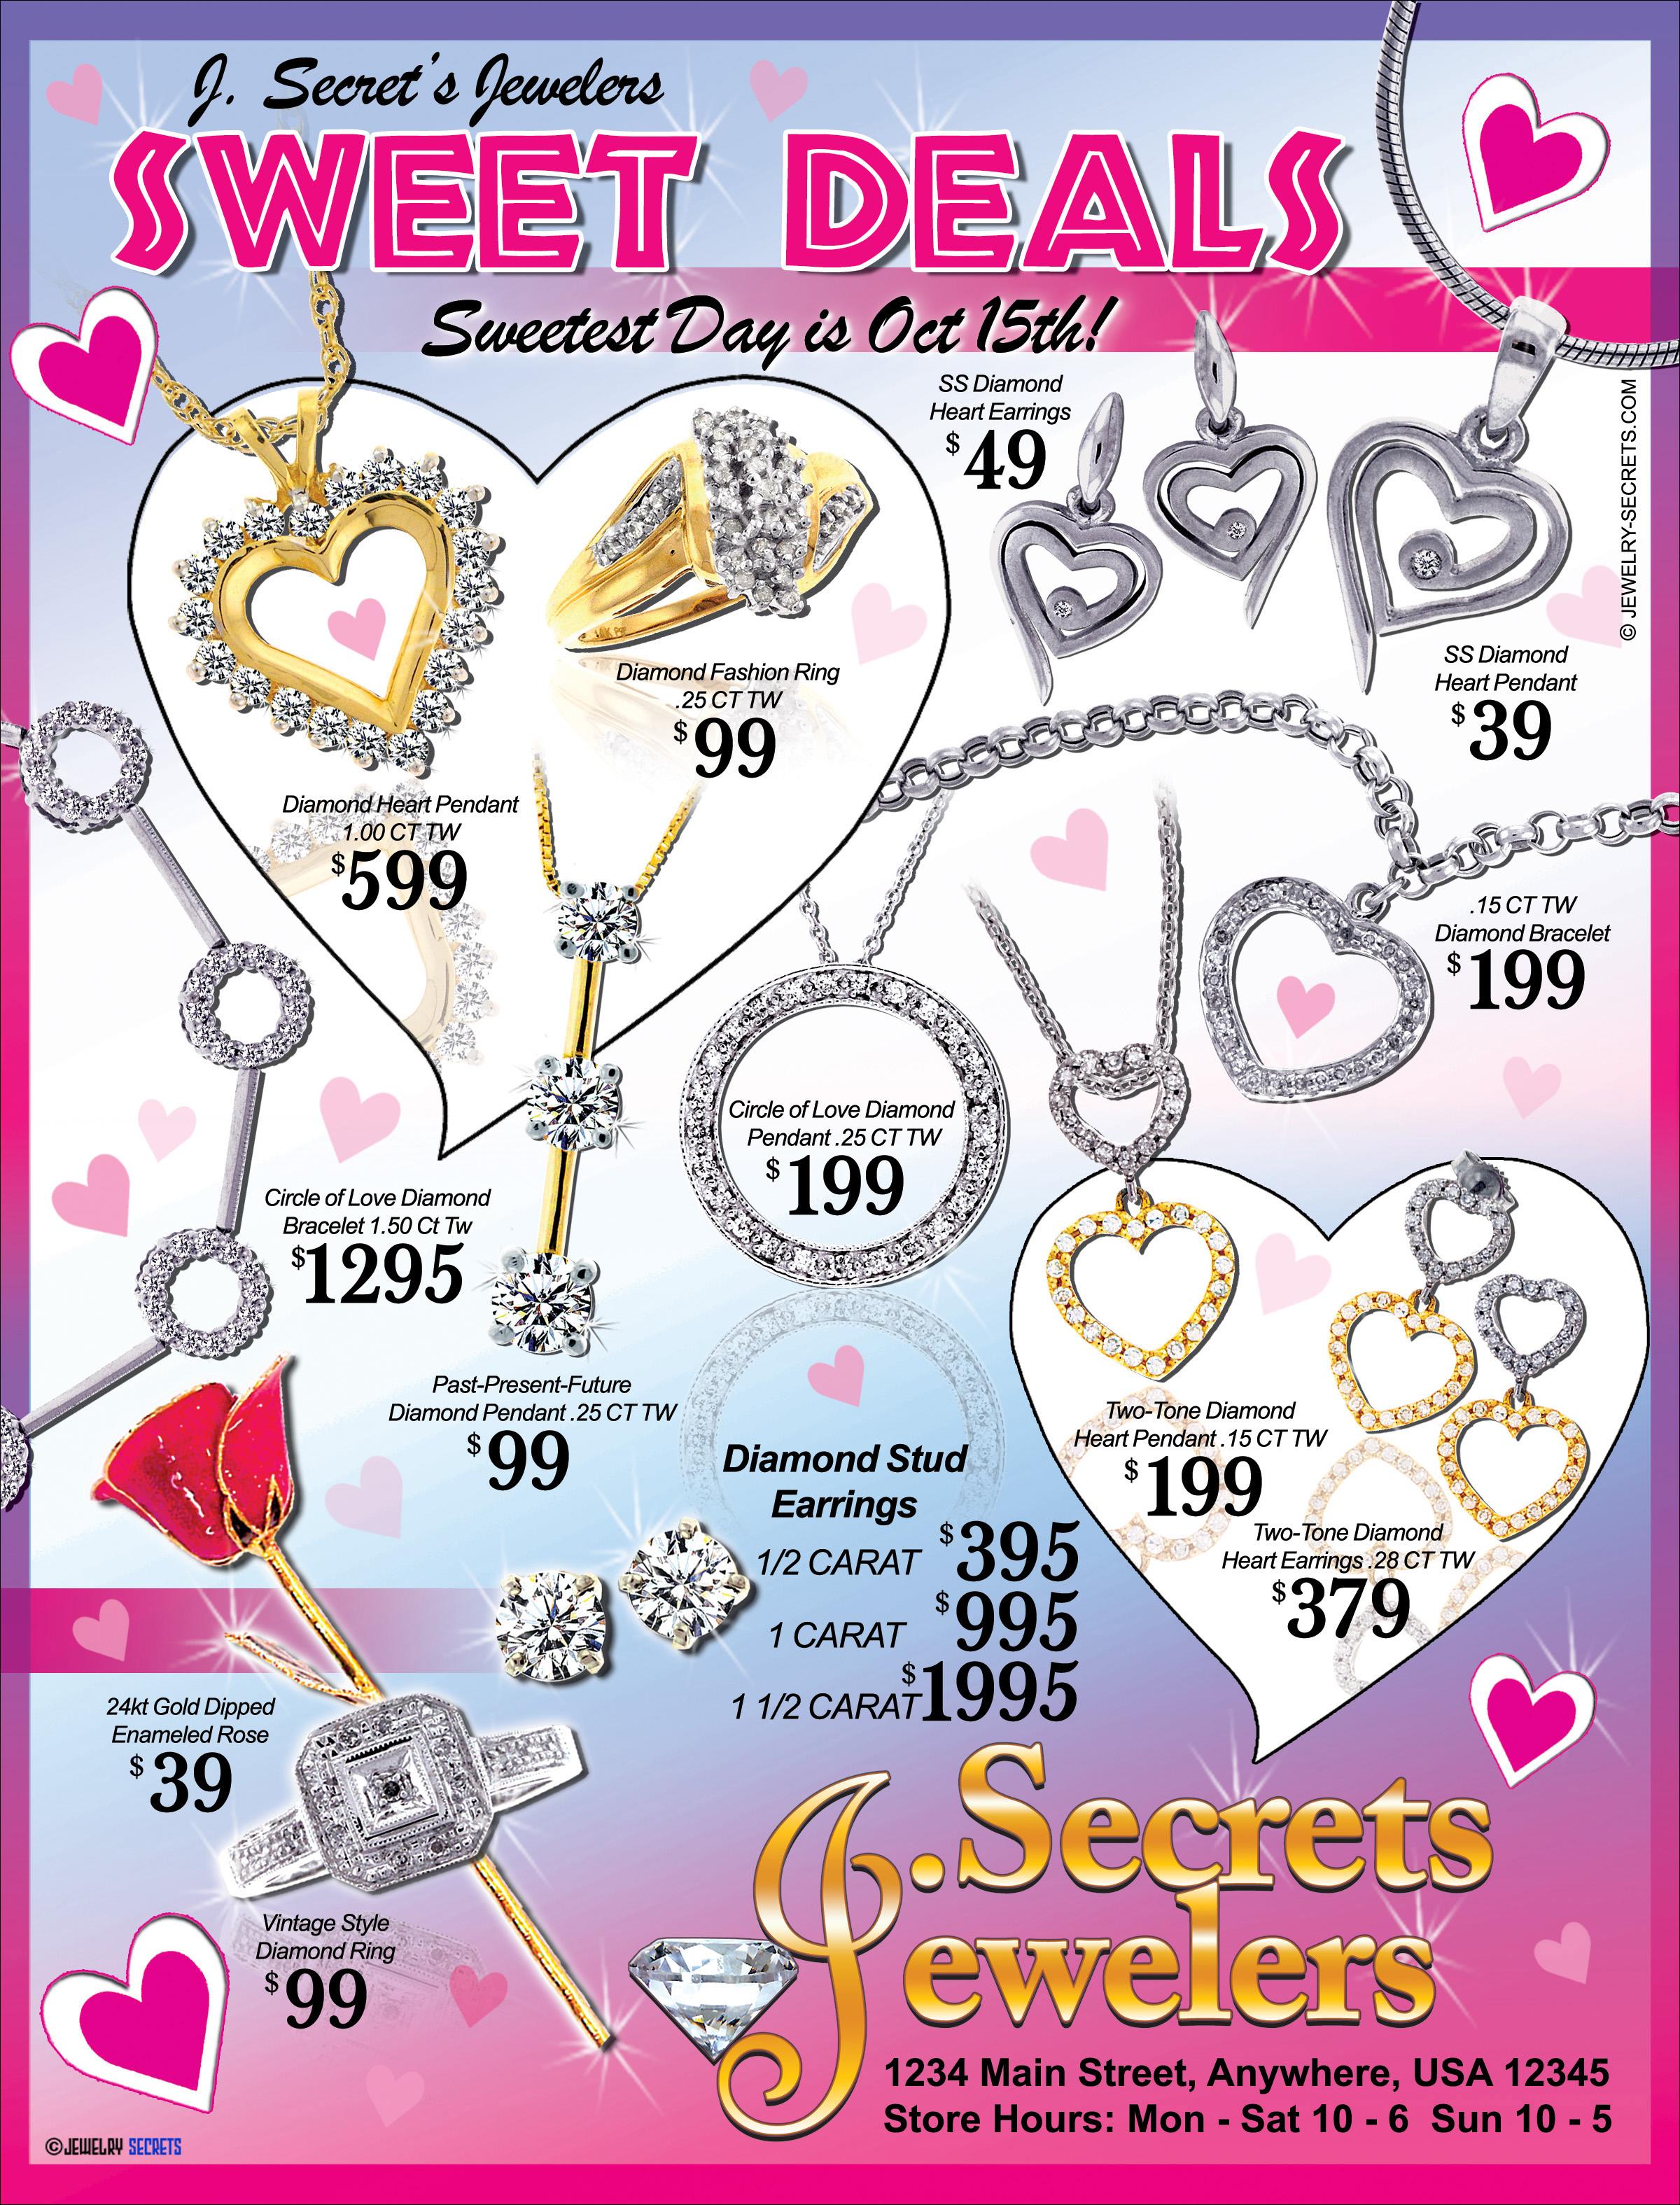 JEWELER'S SWEETEST DAY SALES SAMPLE ADVERTISEMENT – Jewelry Secrets